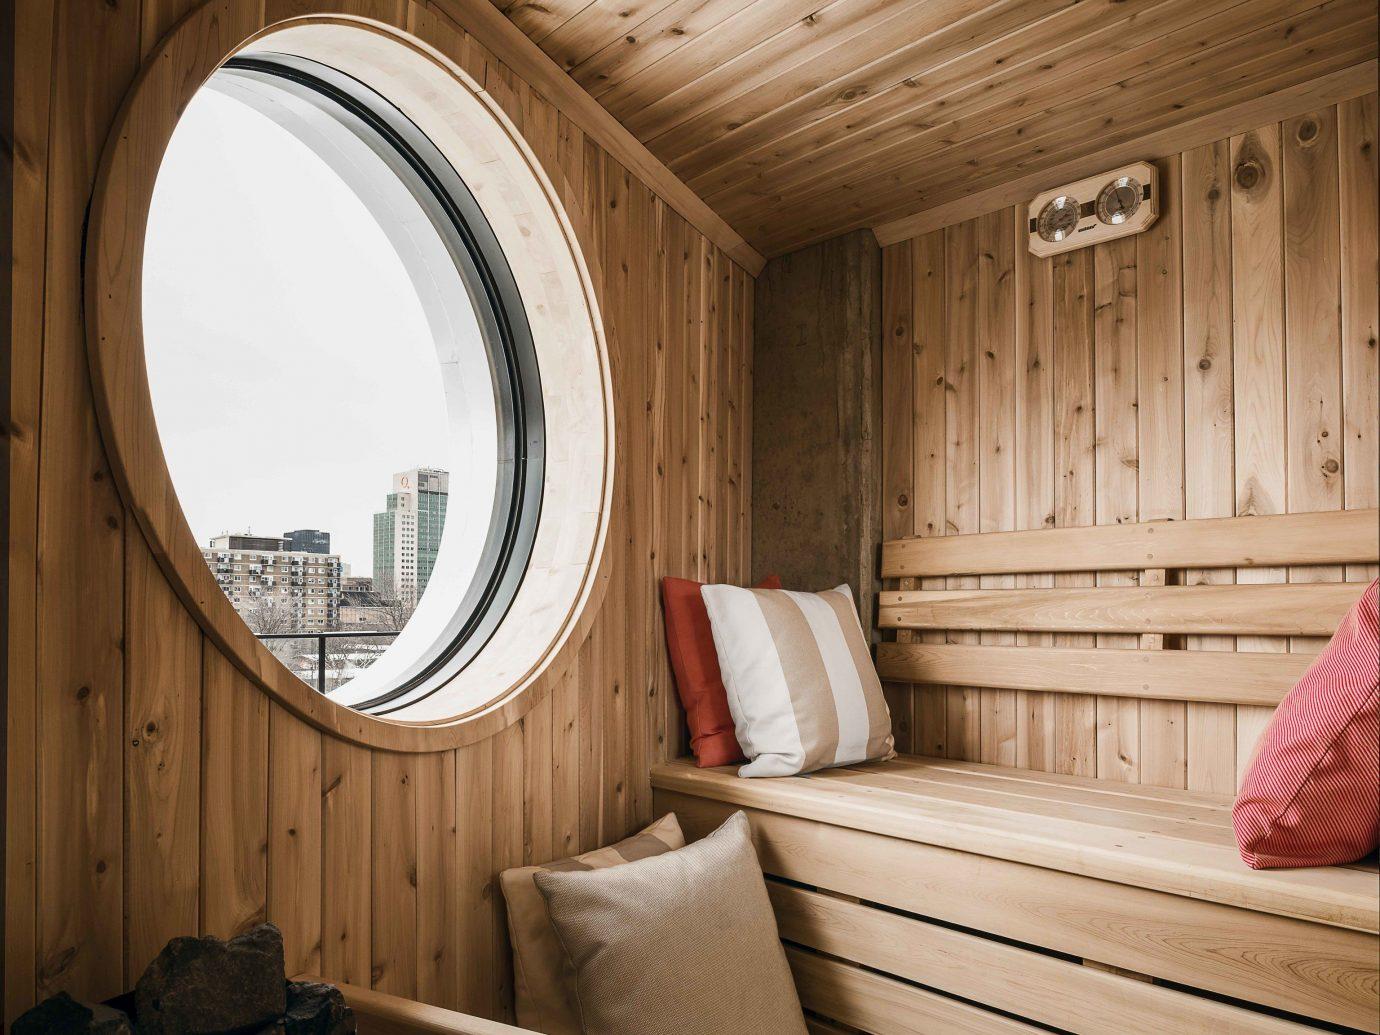 Canada Hotels Montreal Trip Ideas indoor wall wood interior design window home ceiling daylighting wood stain floor Bedroom